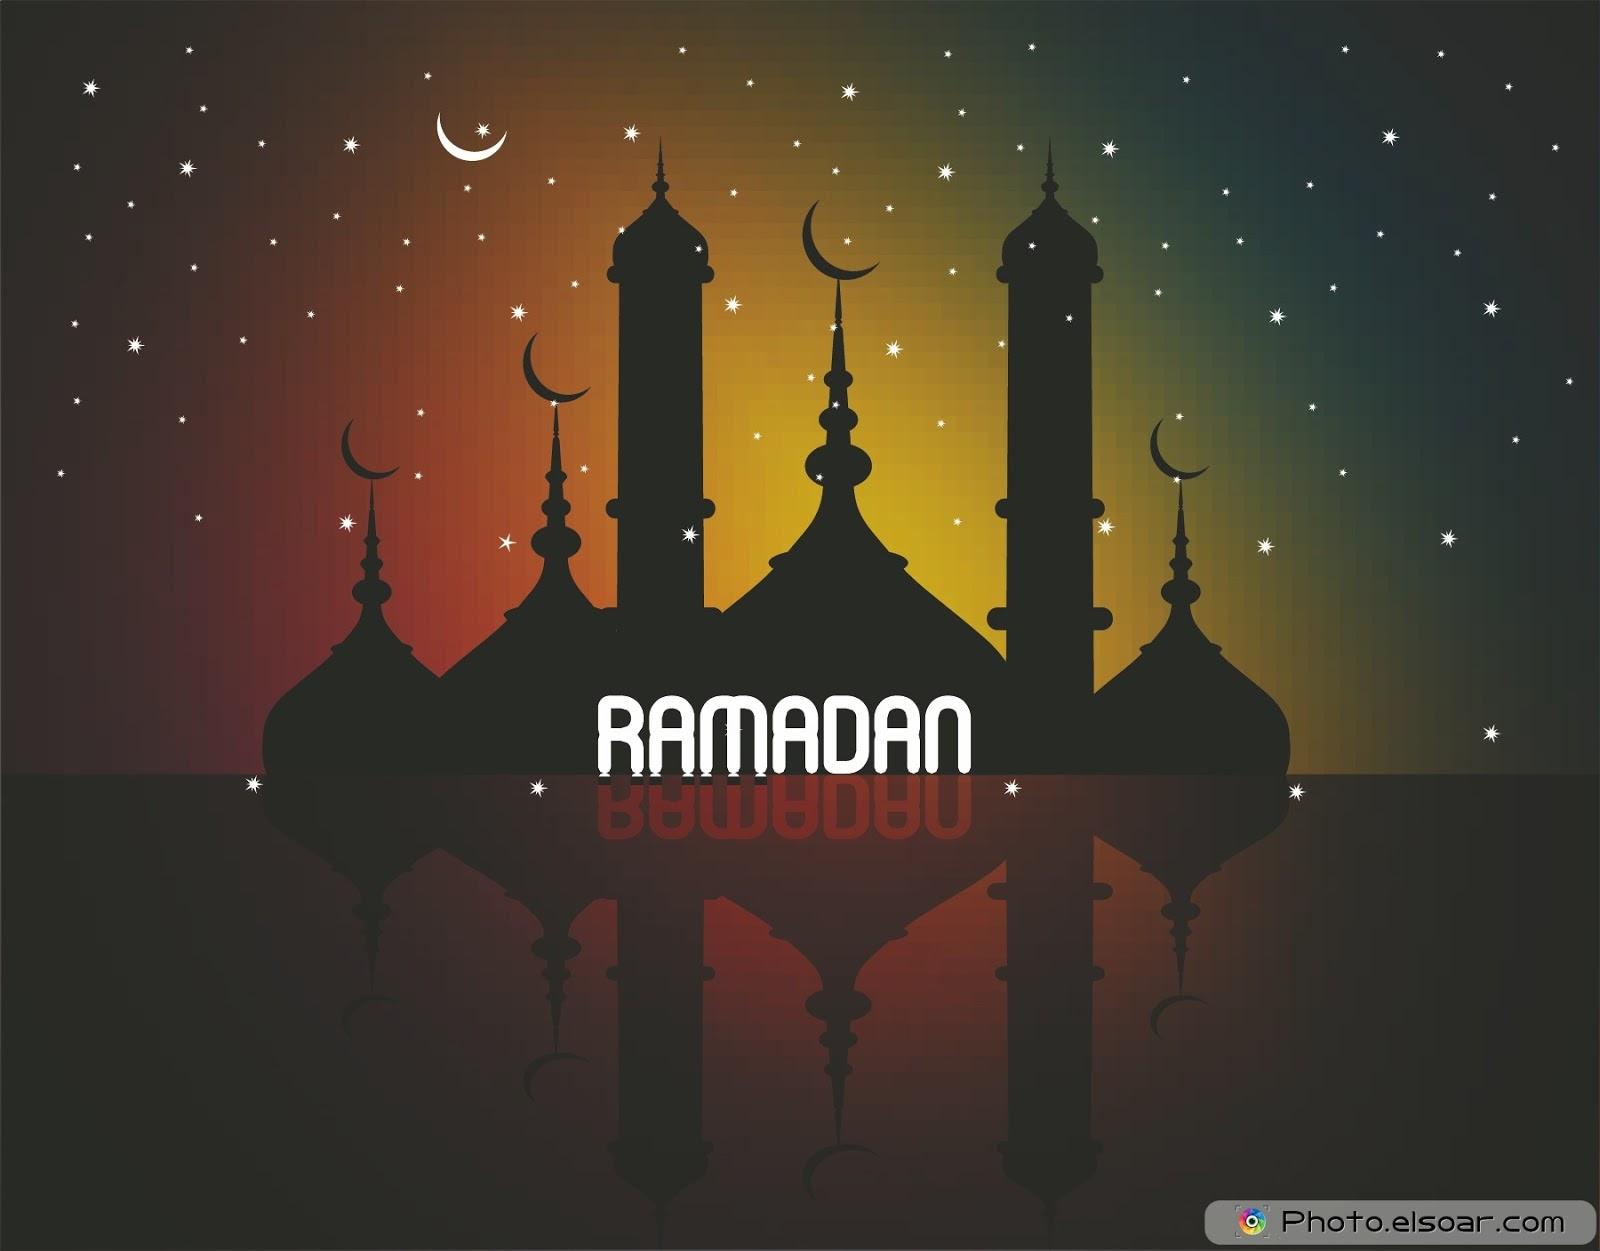 Happy Ramadan Kareem 2019 Quotes and Wishes